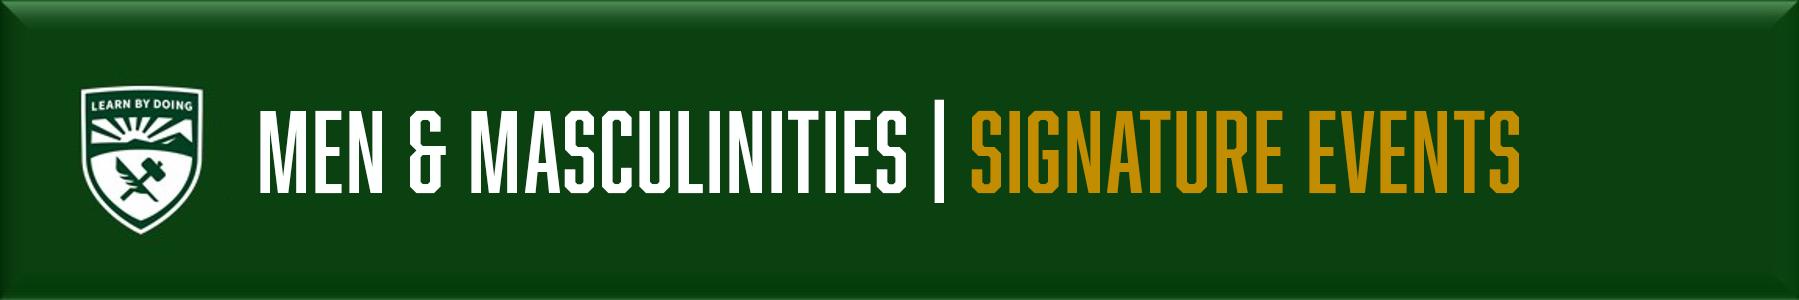 Men & Masculinities - Signature Events